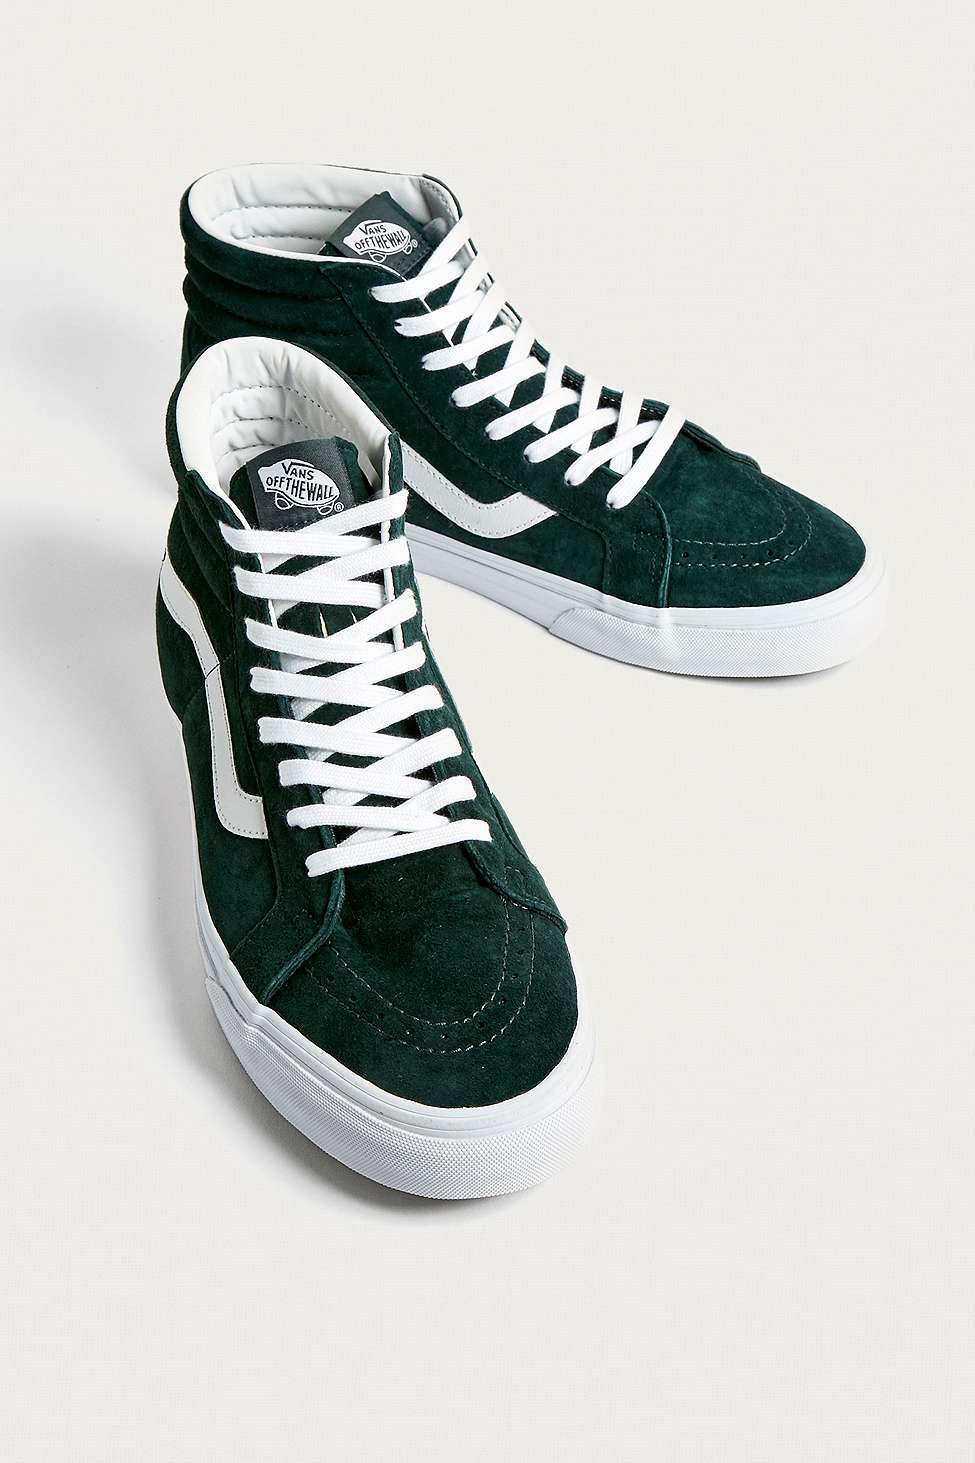 Vans hi spruce suede trainers mens uk in green for men lyst jpg 975x1463 Vans  authentic e823d54ba